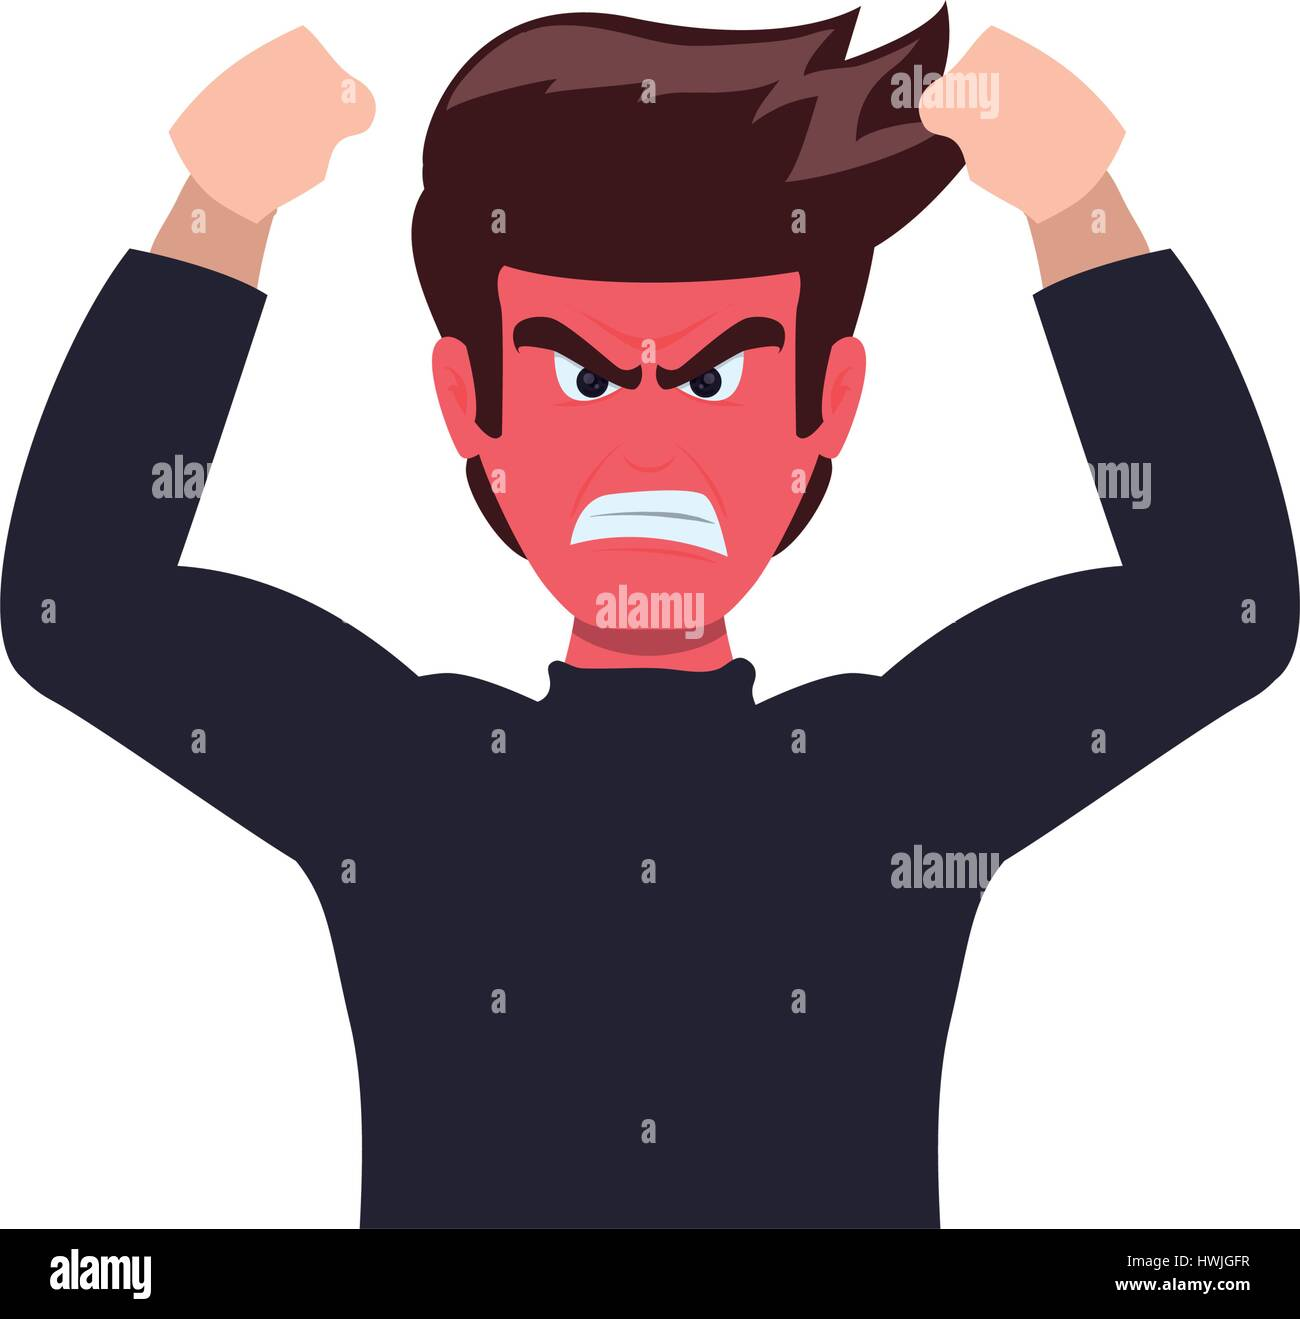 angry cartoon face stock